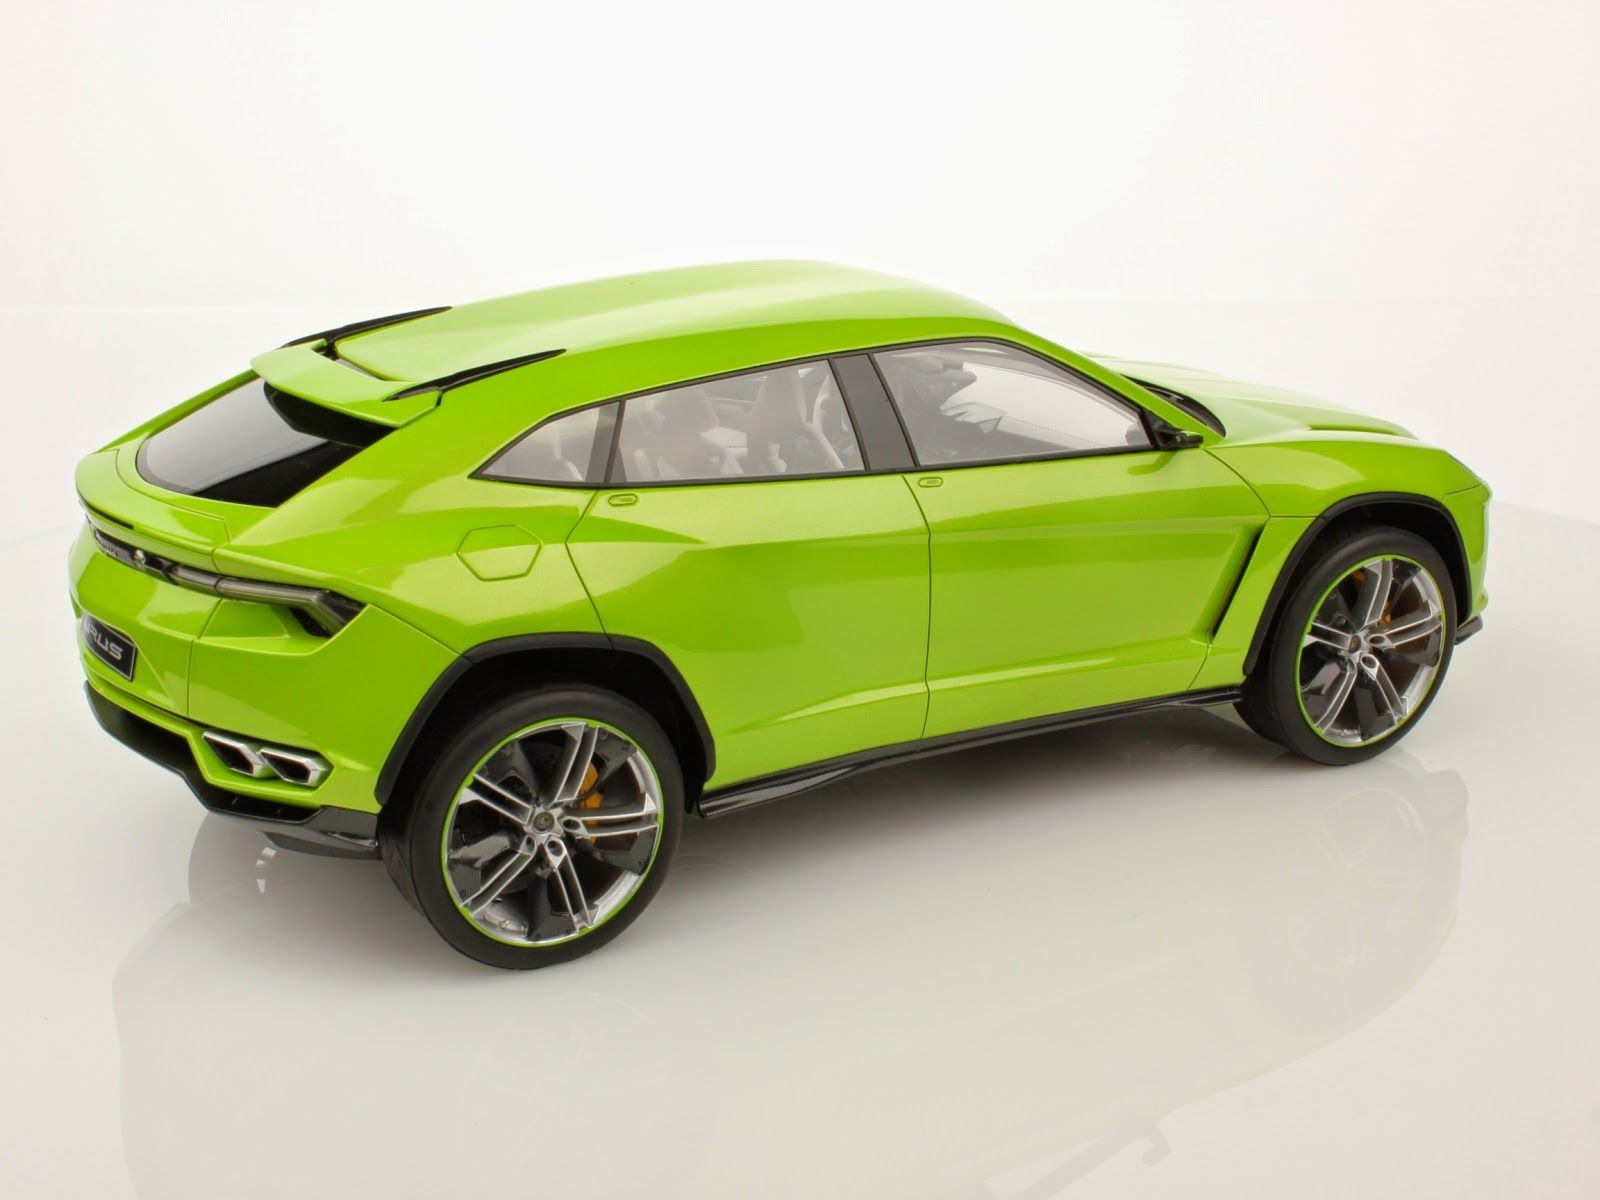 Lamborghini Urus Suv Will Have Similar Pricetag To Huracan Lamborghini Lamborghini Huracan Suv